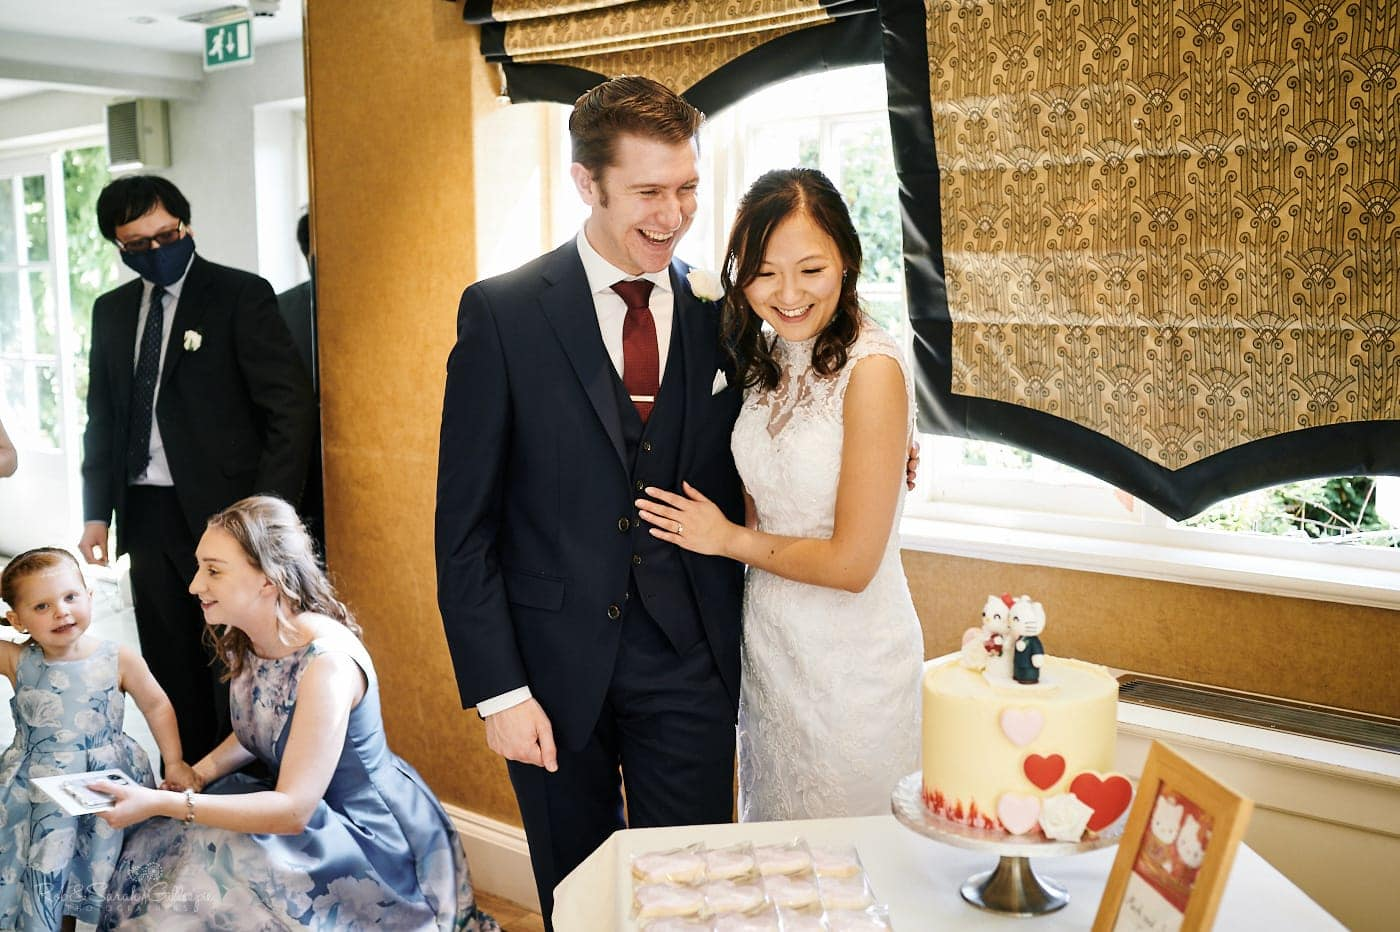 Bride and groom look at wedding cake